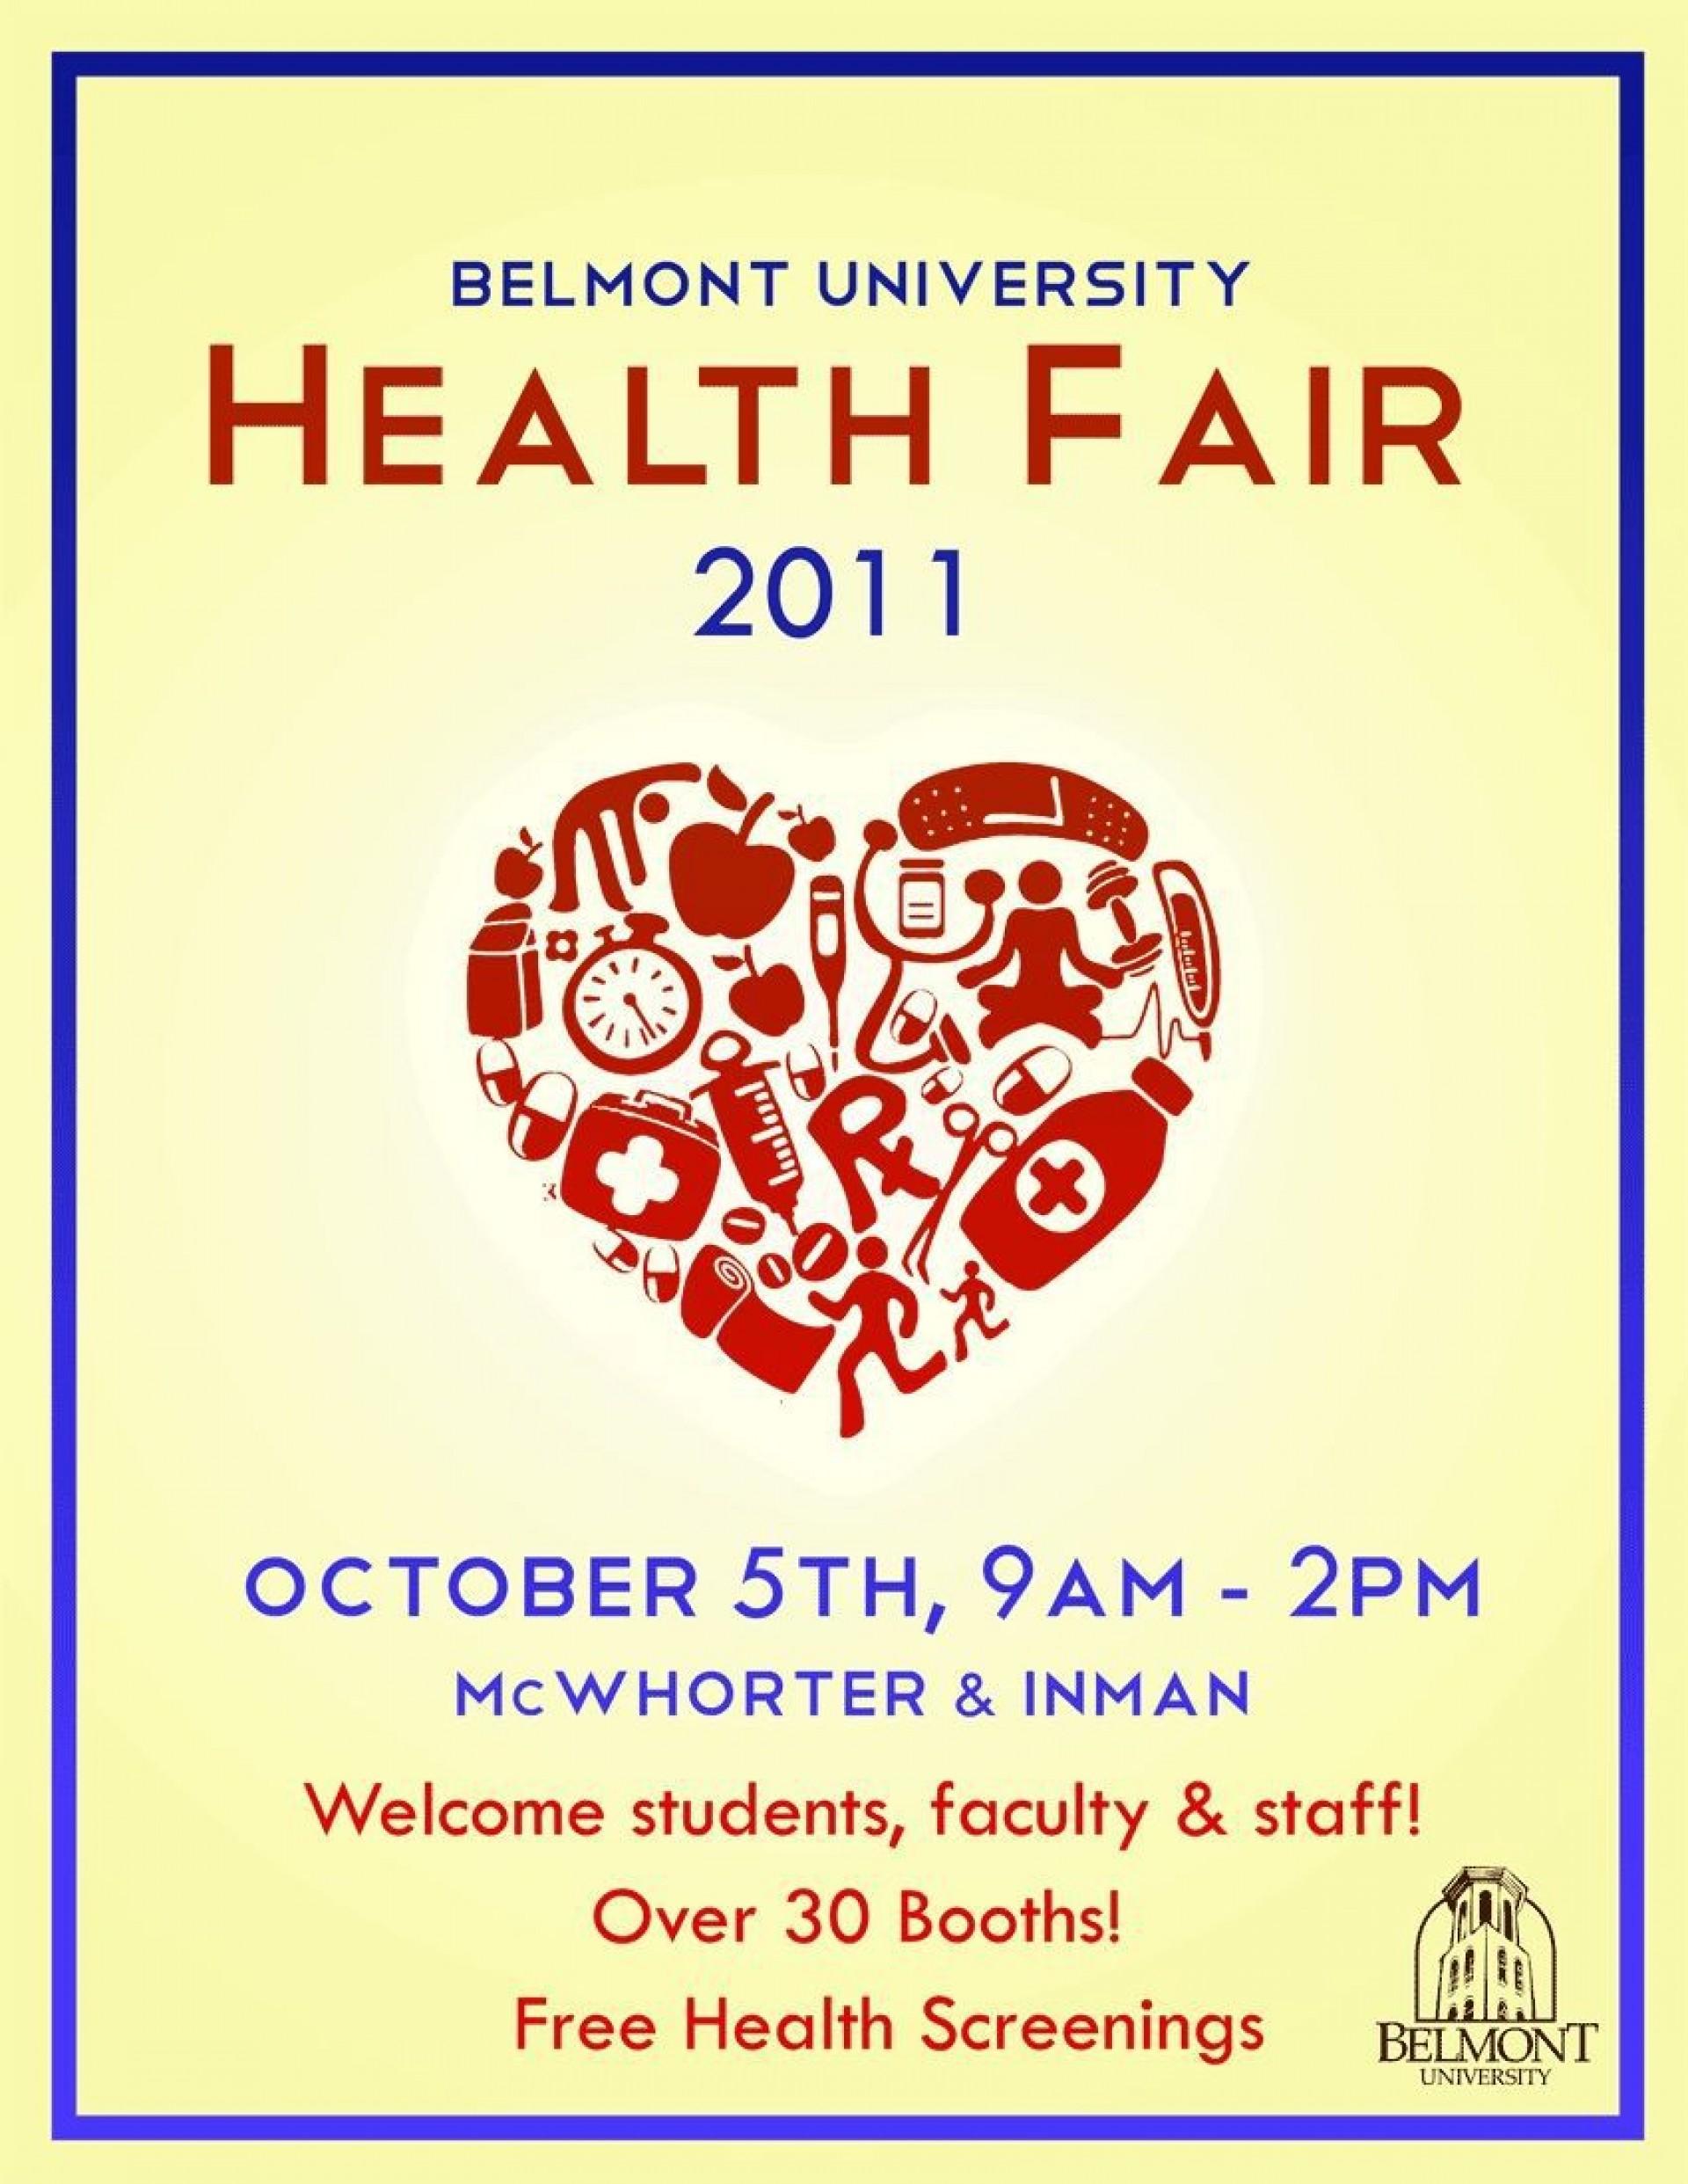 004 Wonderful Health Fair Flyer Template Free Design  Download1920